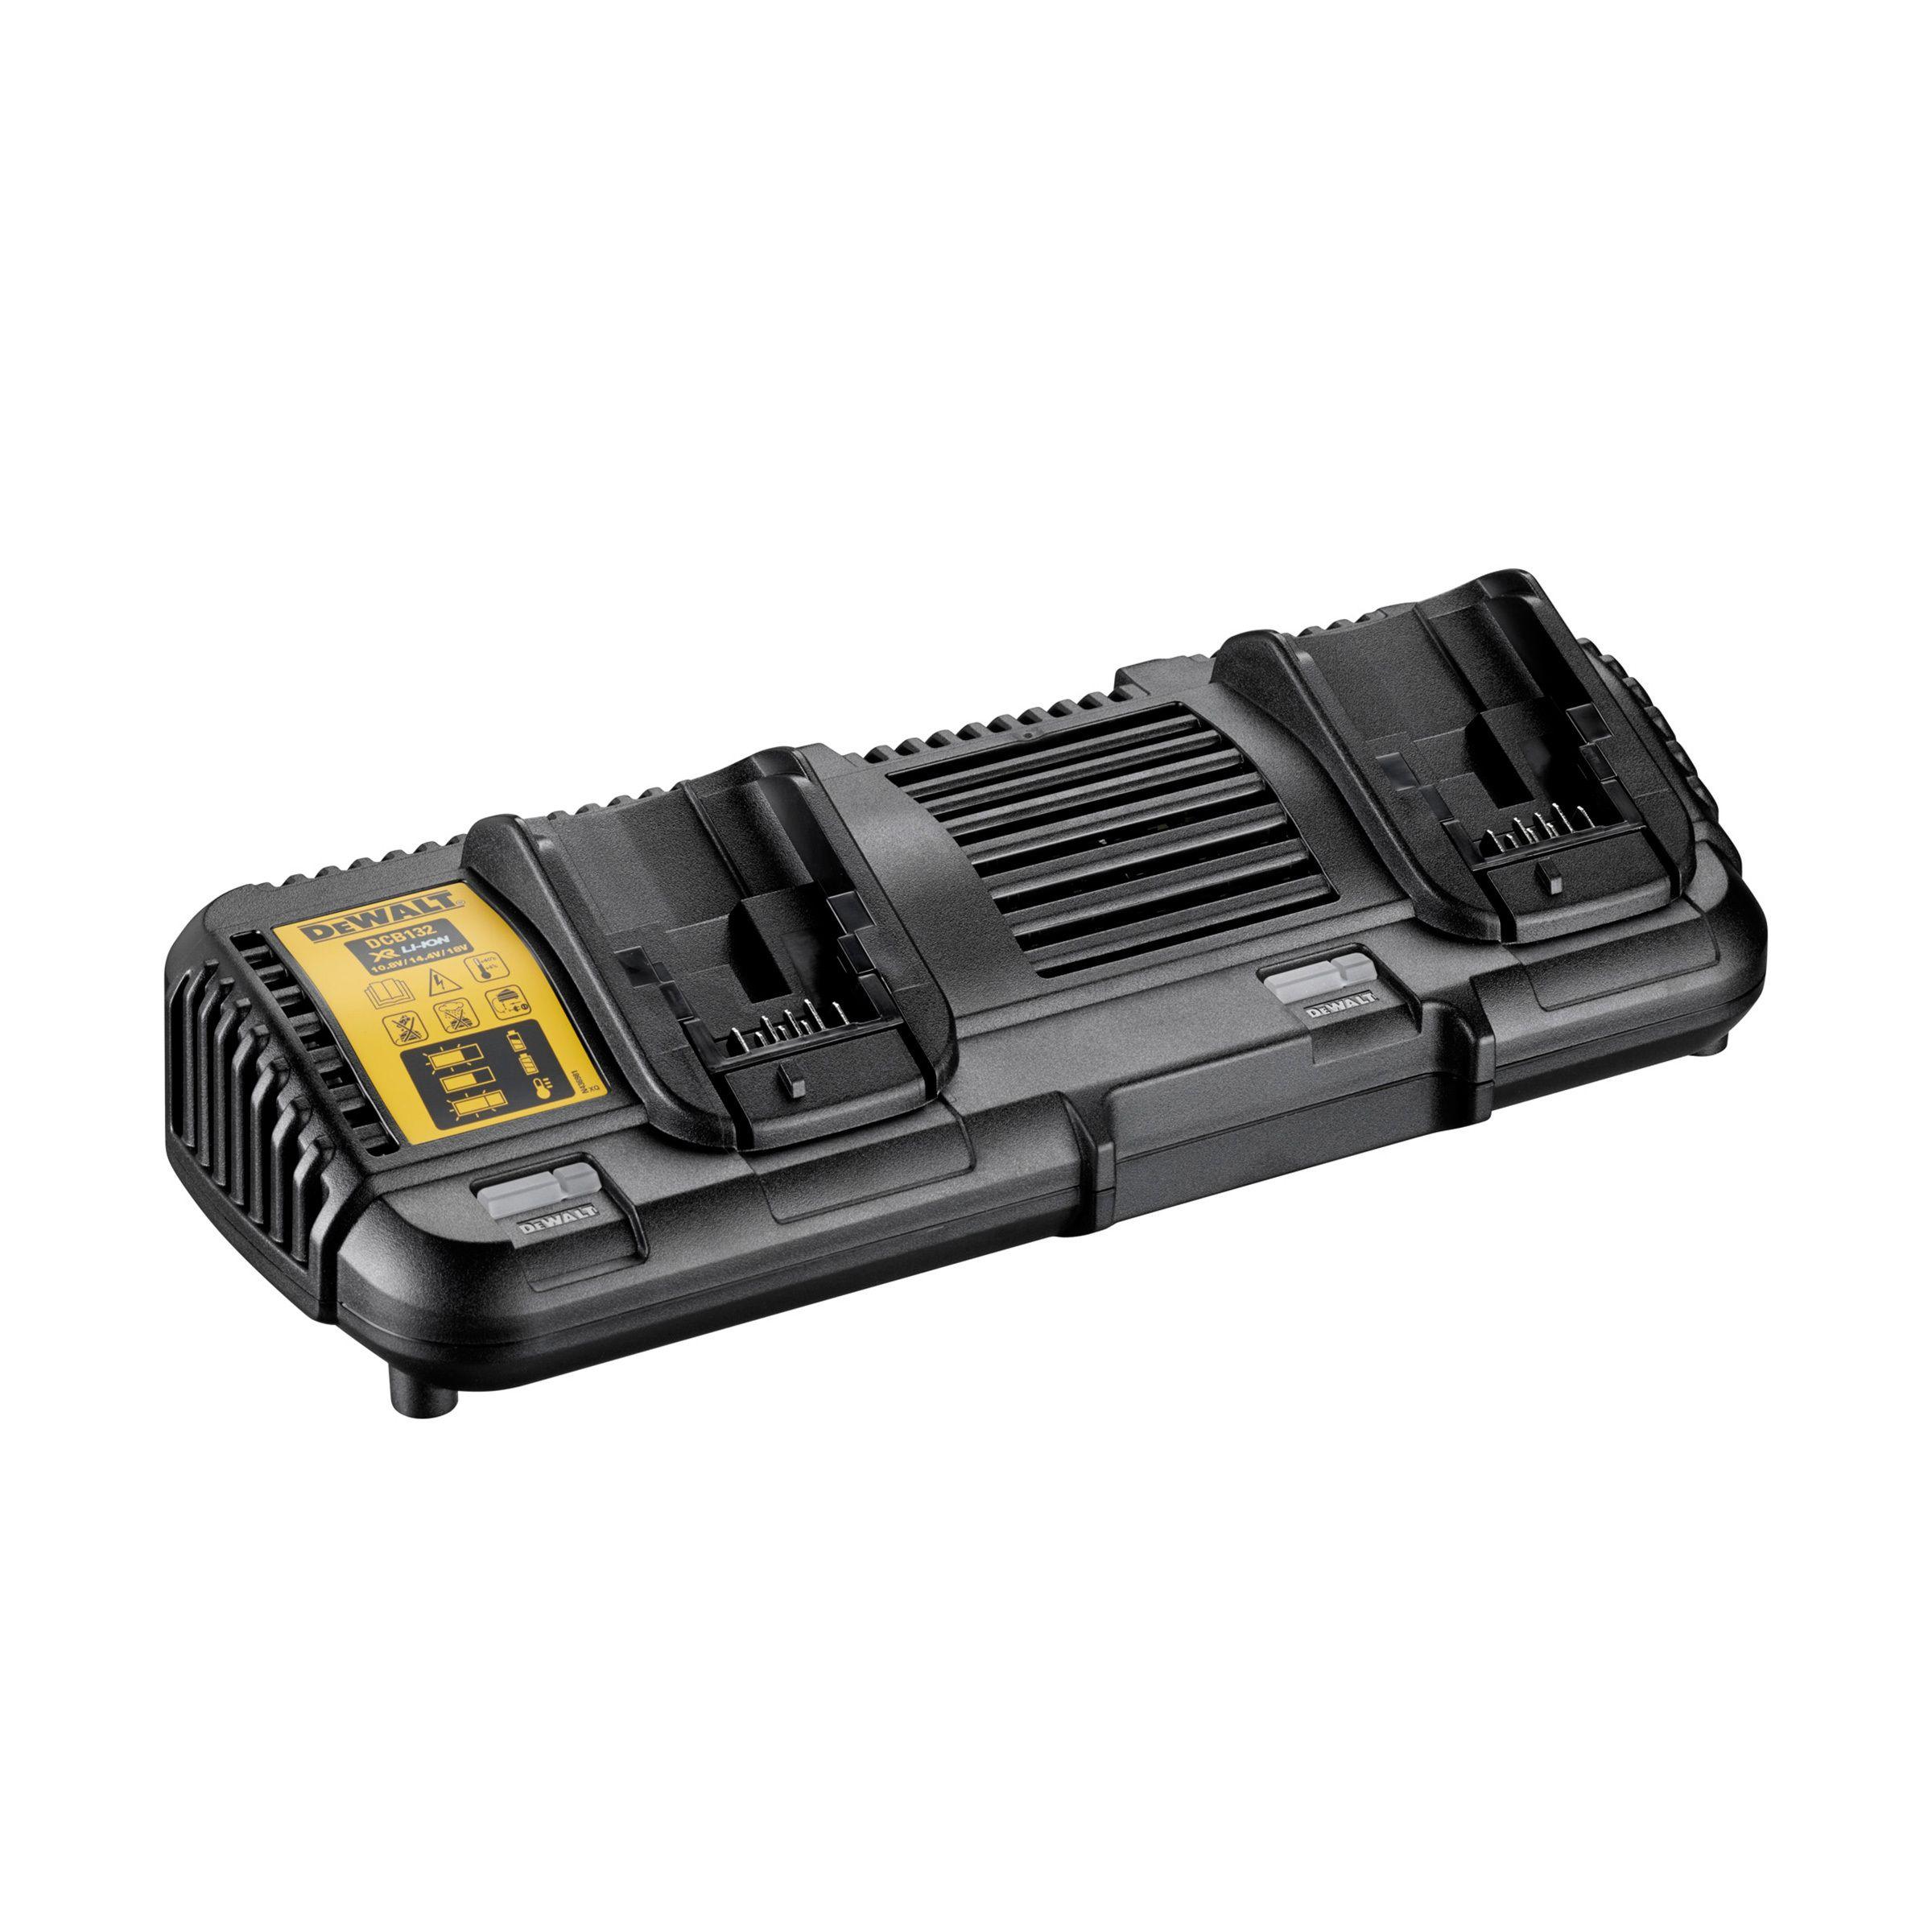 Dewalt XR FLEXVOLT dvojitá nabíječka - akumulátory XR 18 V a 54 V